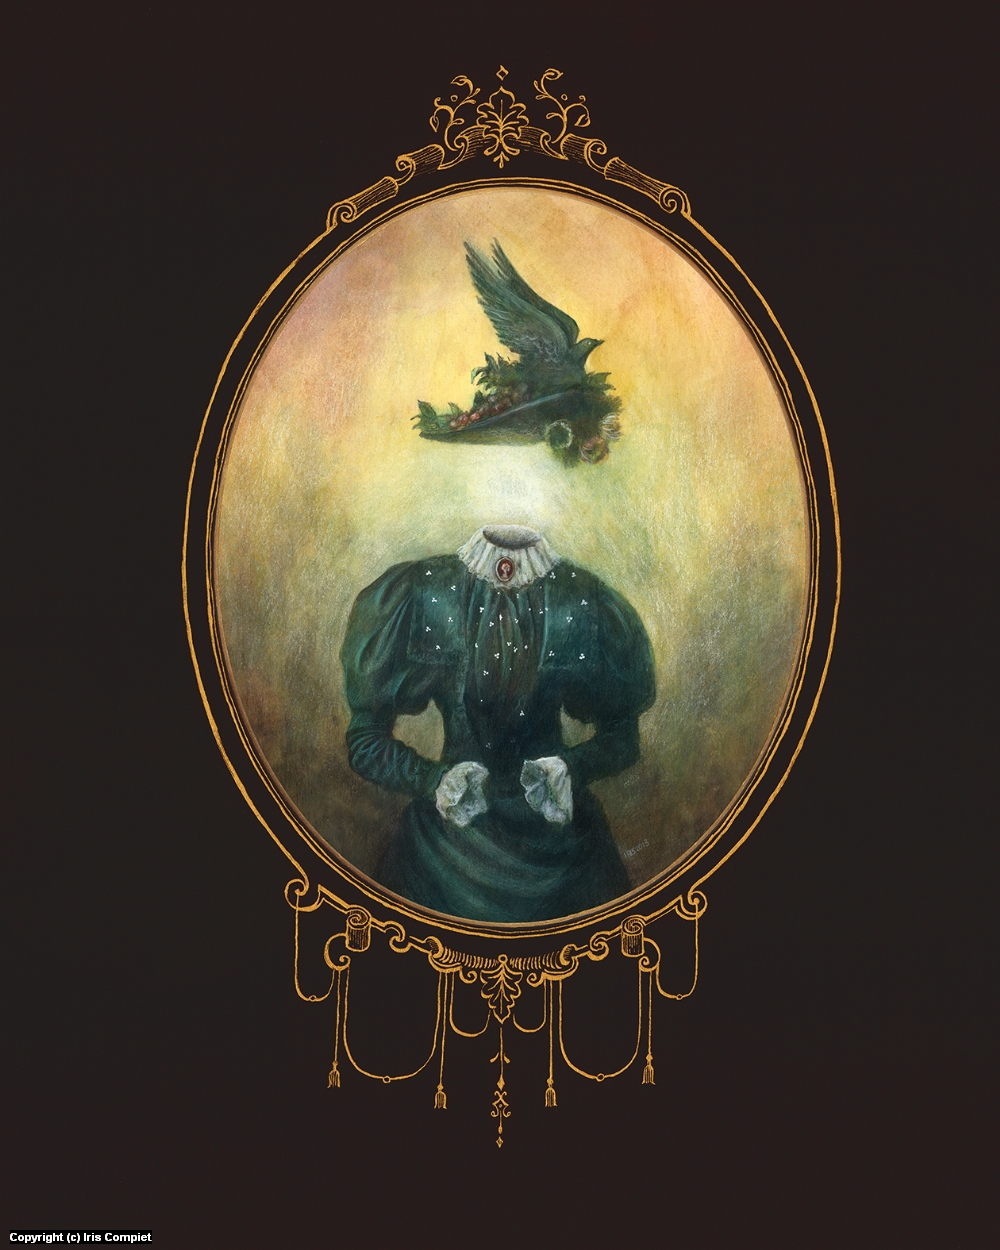 Gertrude Ghost Artwork by iris compiet